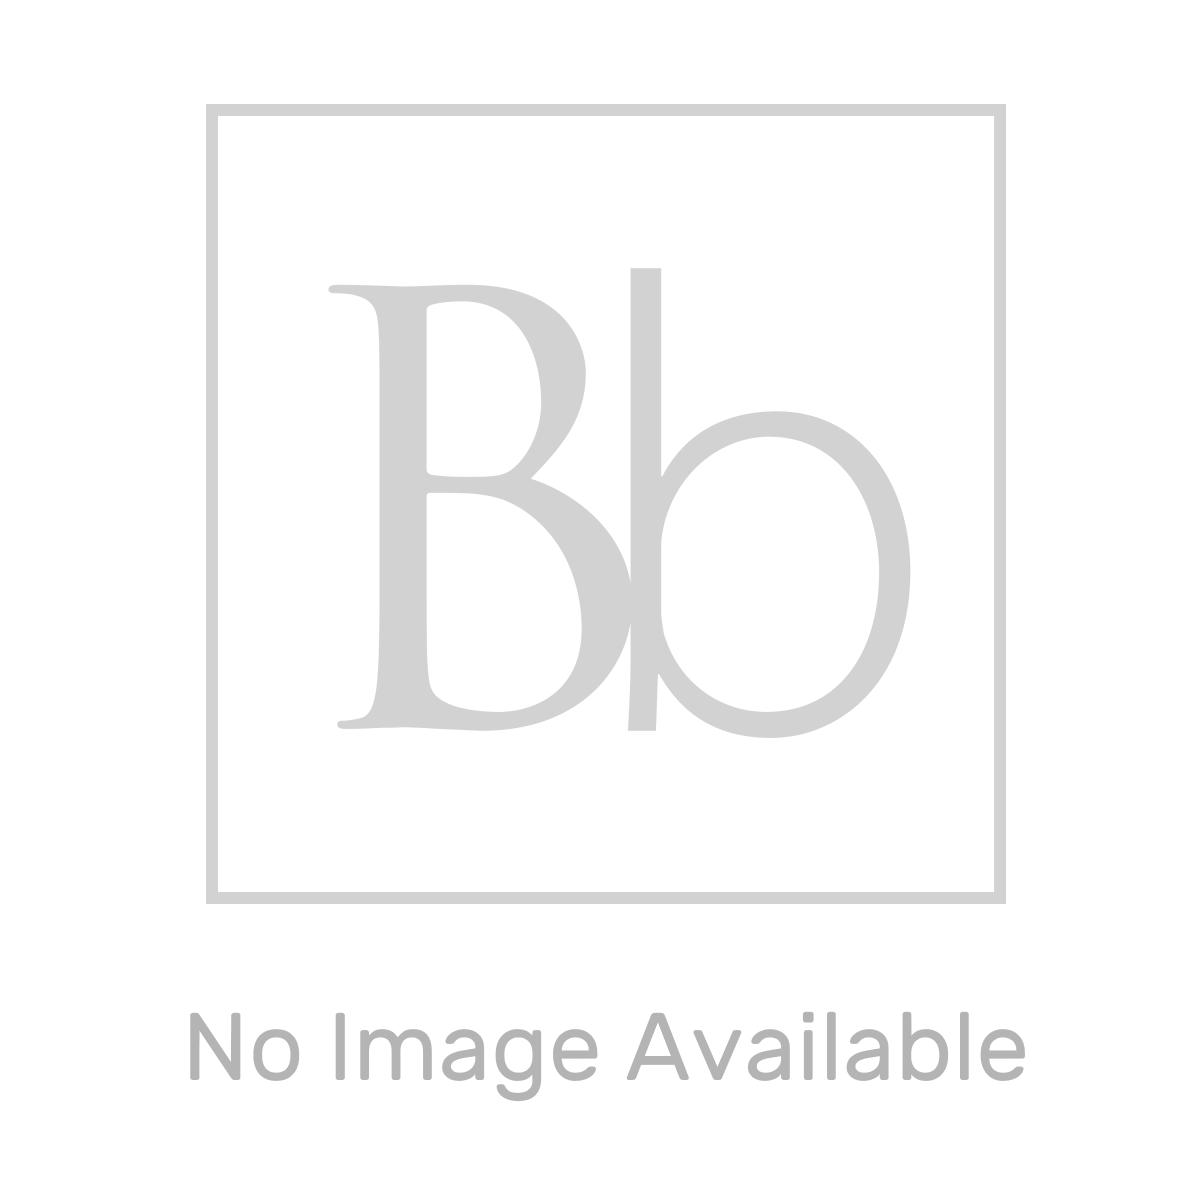 Croydex Shire White Steel Double Door Illuminated Cabinet